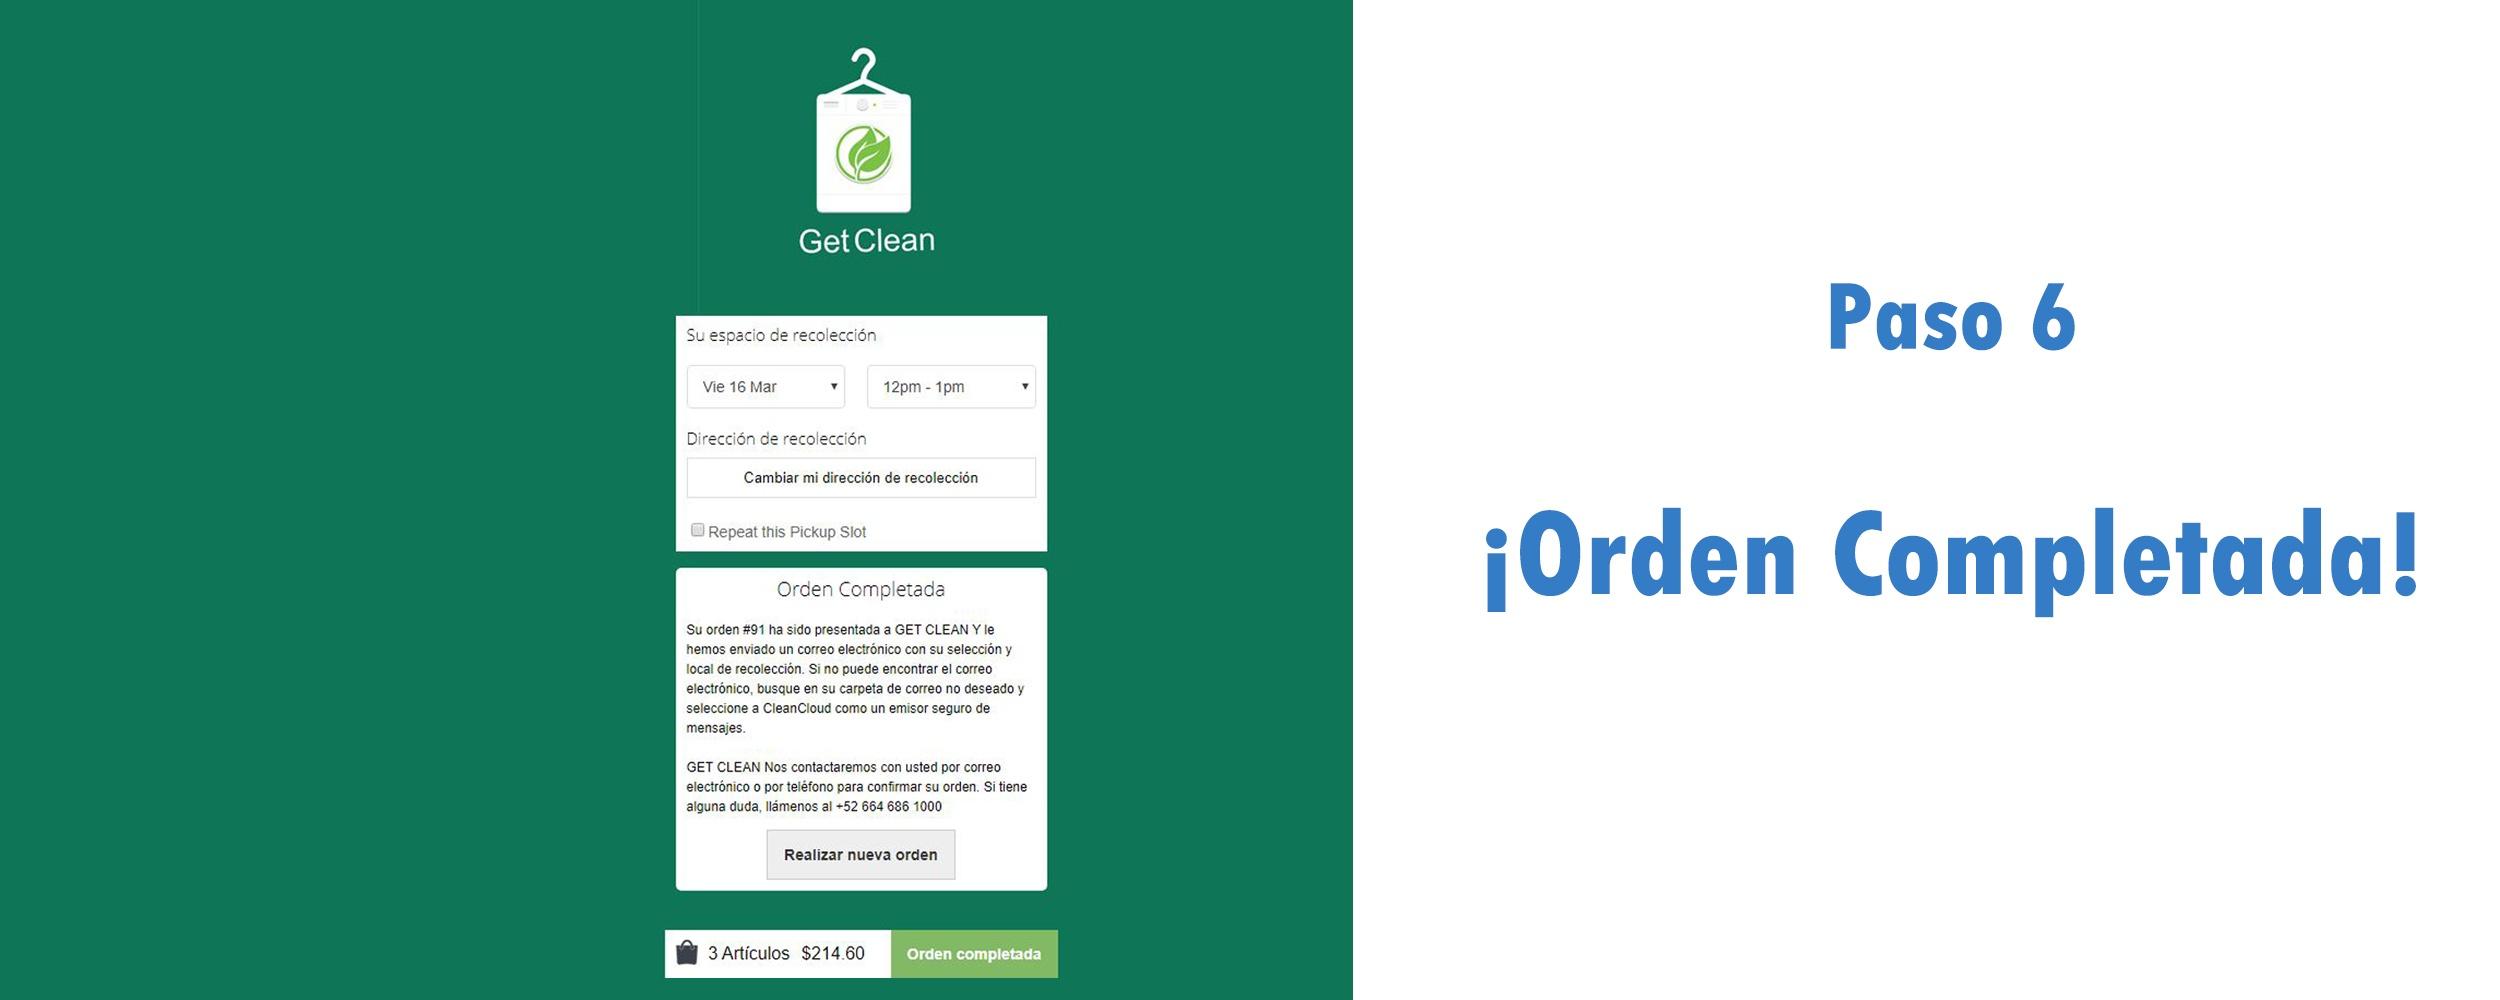 https://0201.nccdn.net/1_2/000/000/088/454/paso-6mejorado-2500x1000.jpg